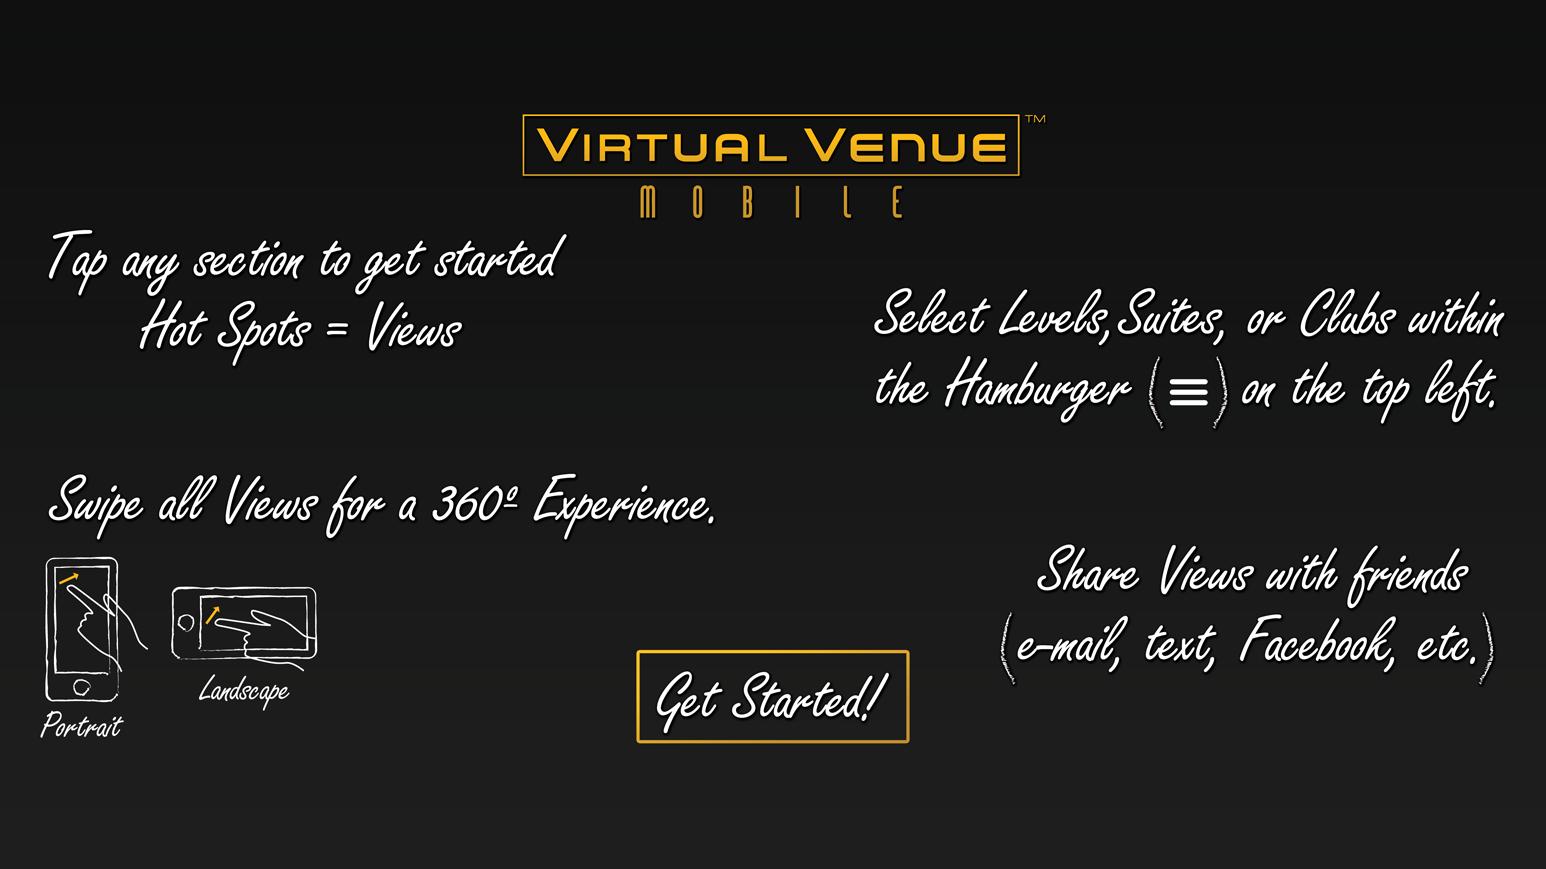 Washington Capitals Virtual Venue By Iomedia